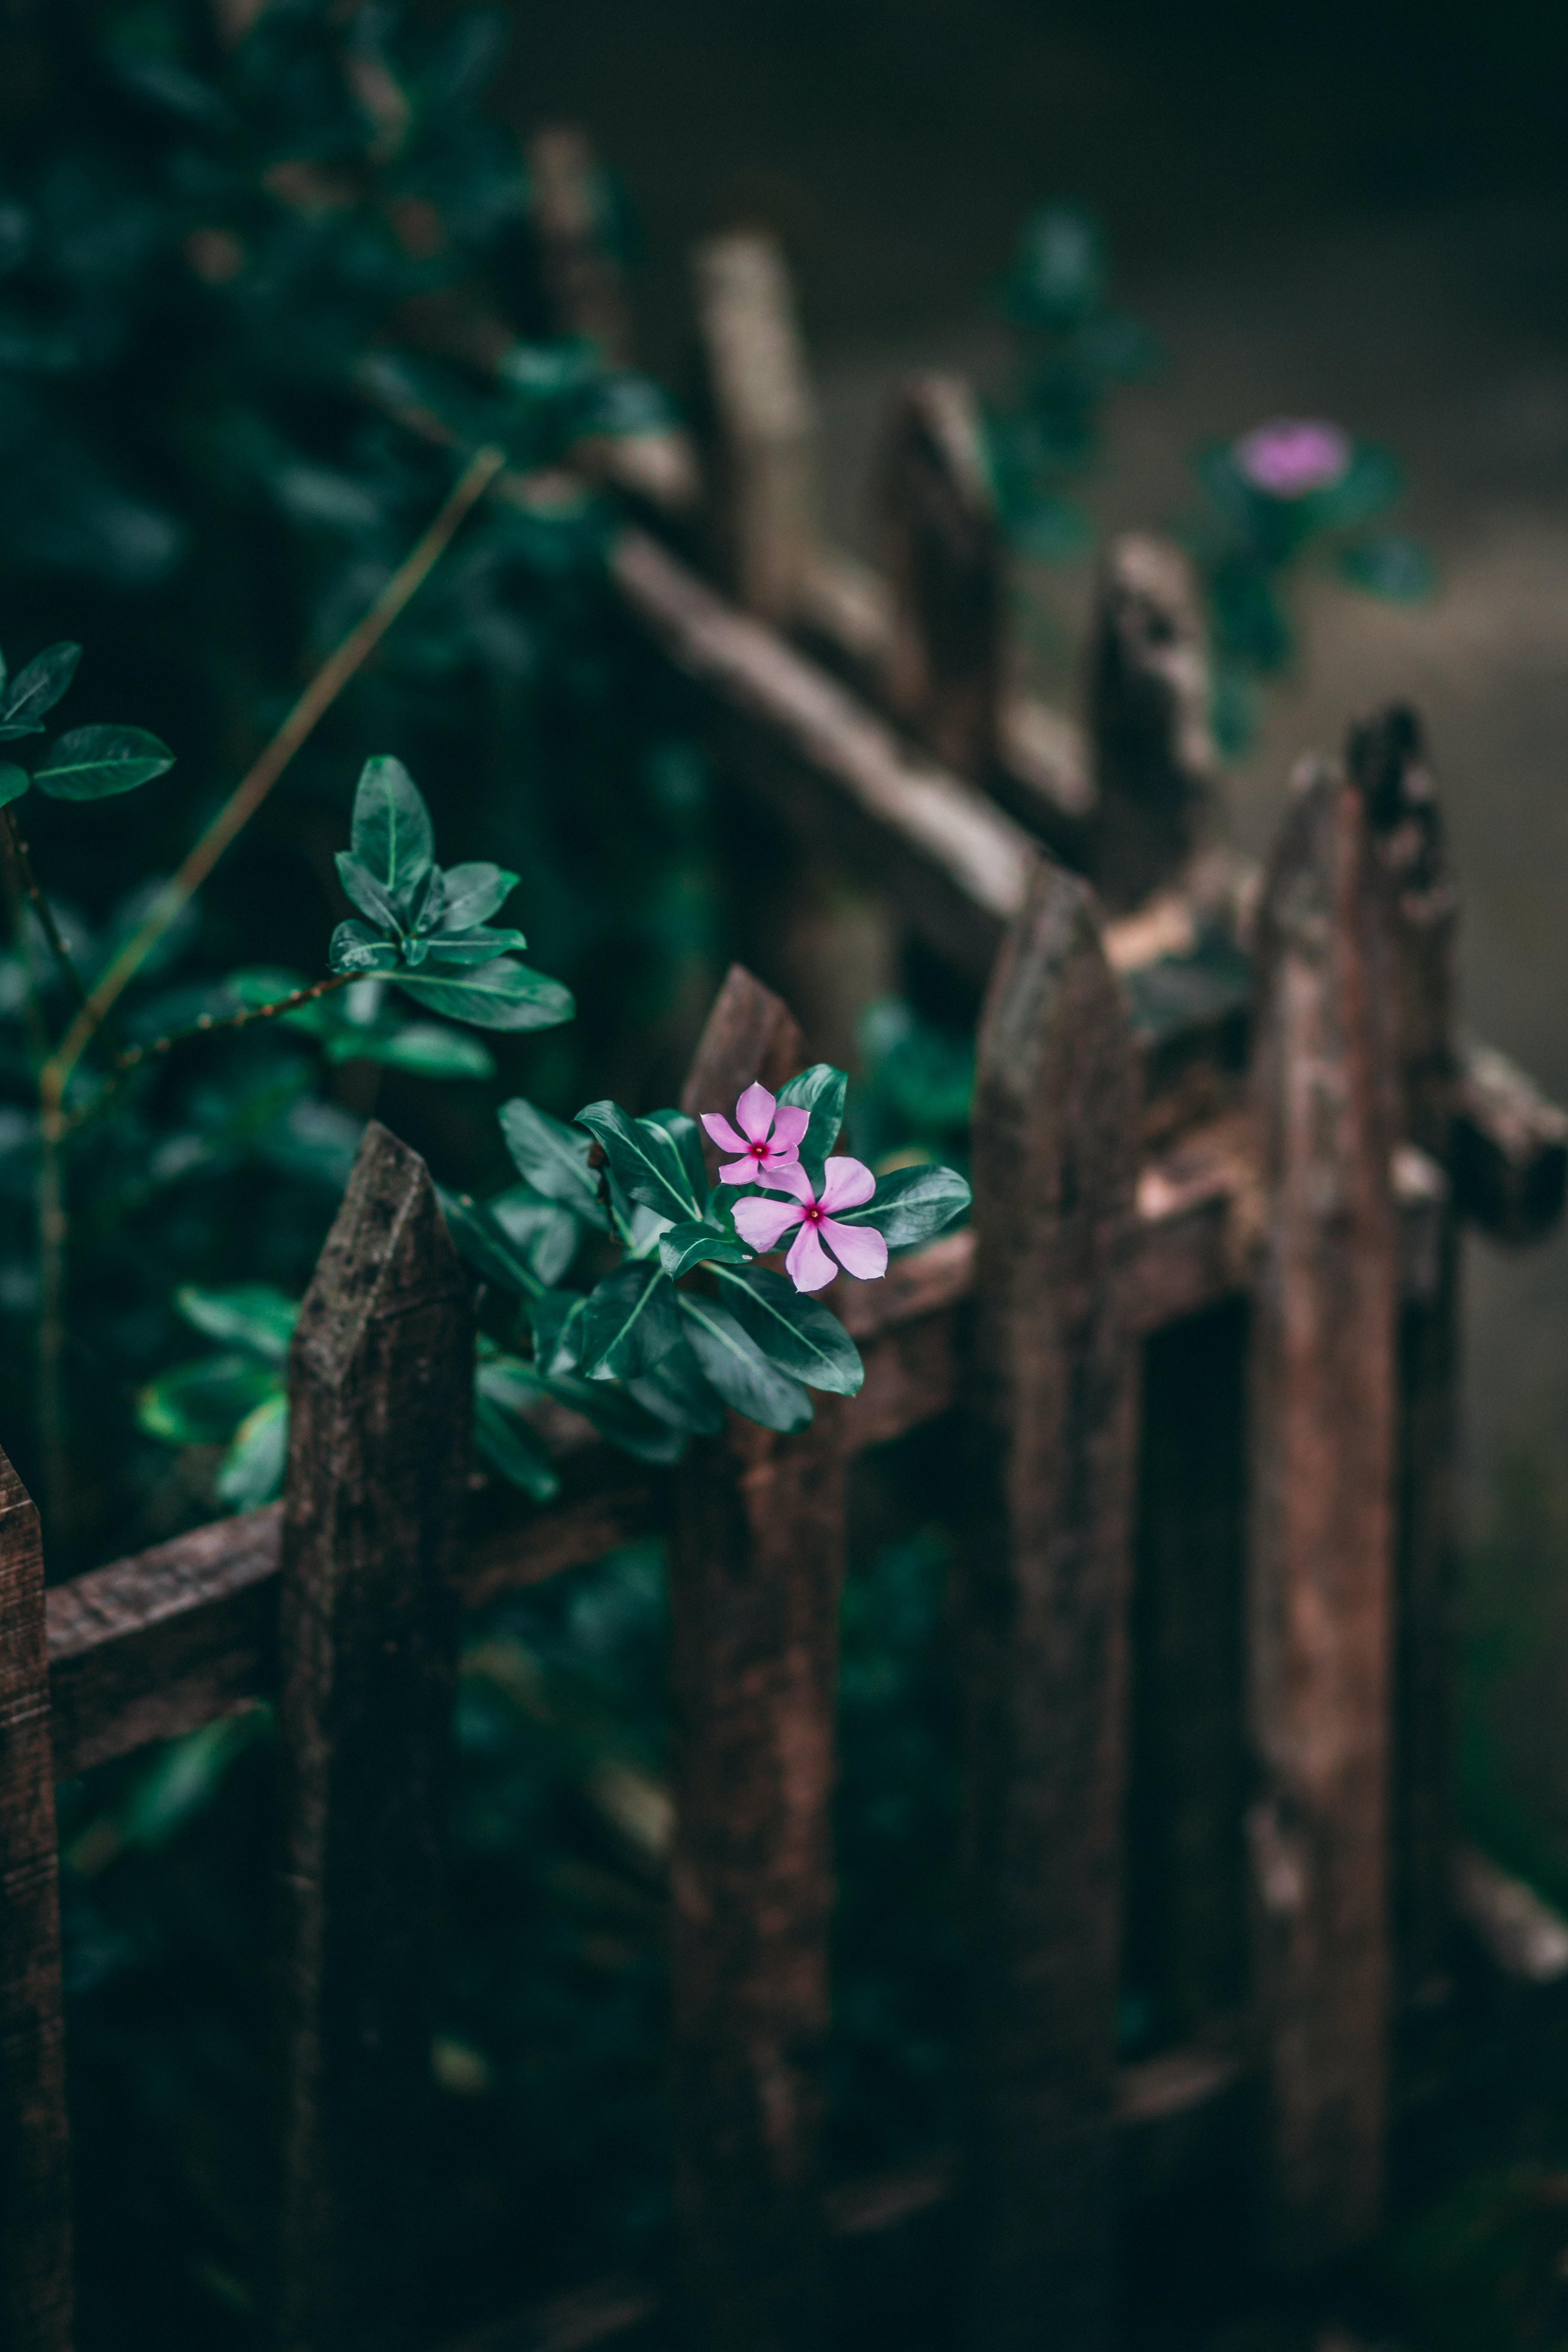 shallow focus of pink petal flower